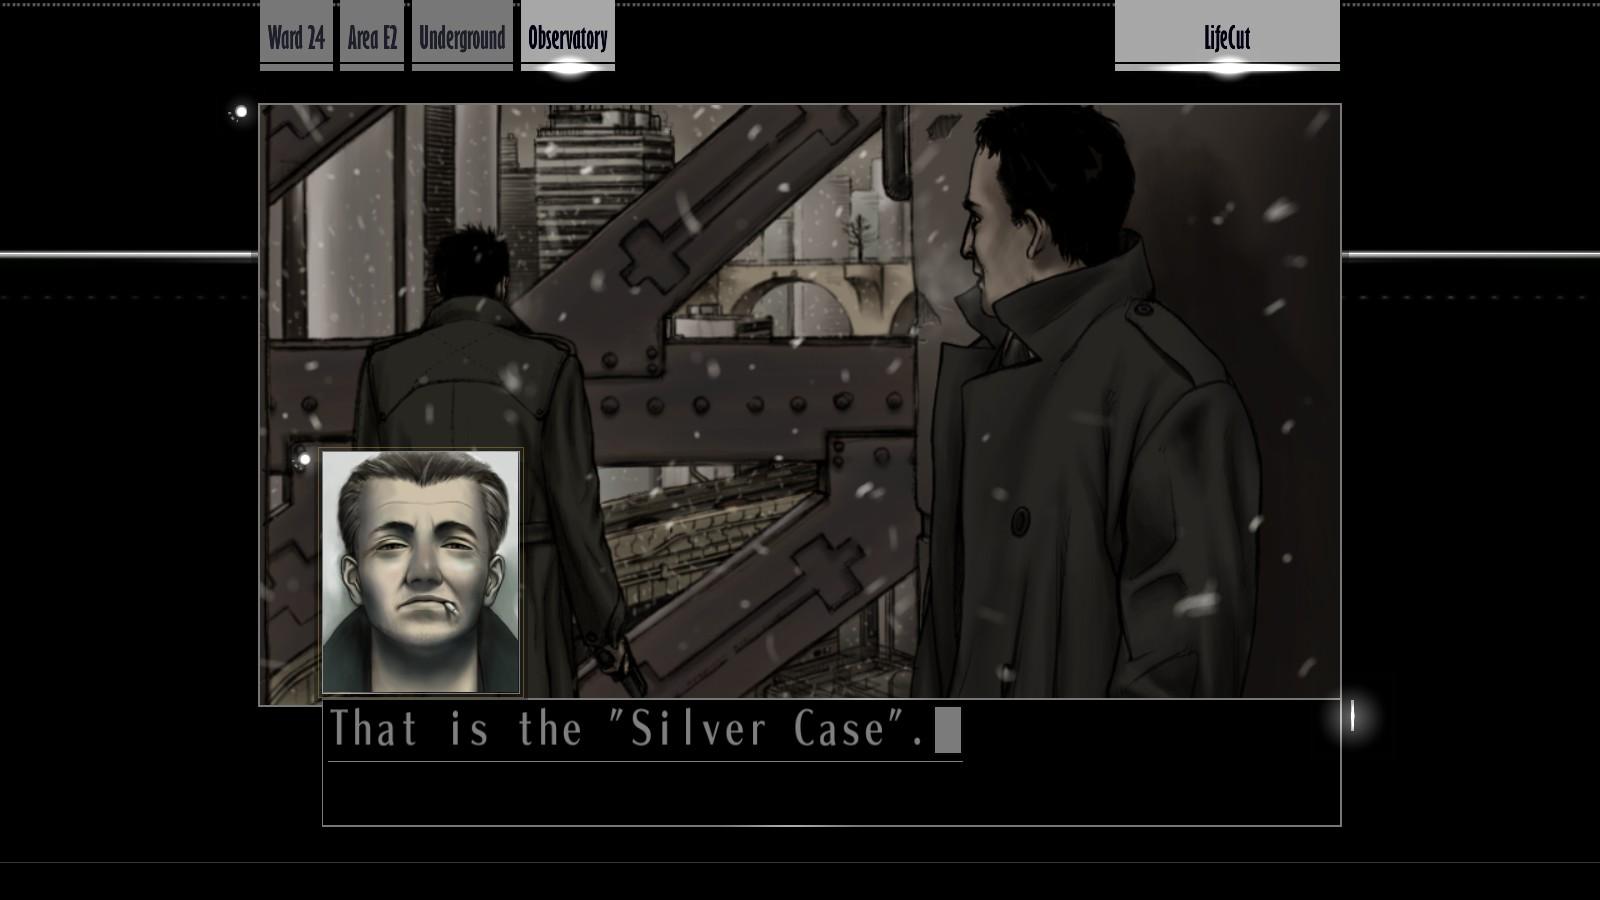 The Silver Case